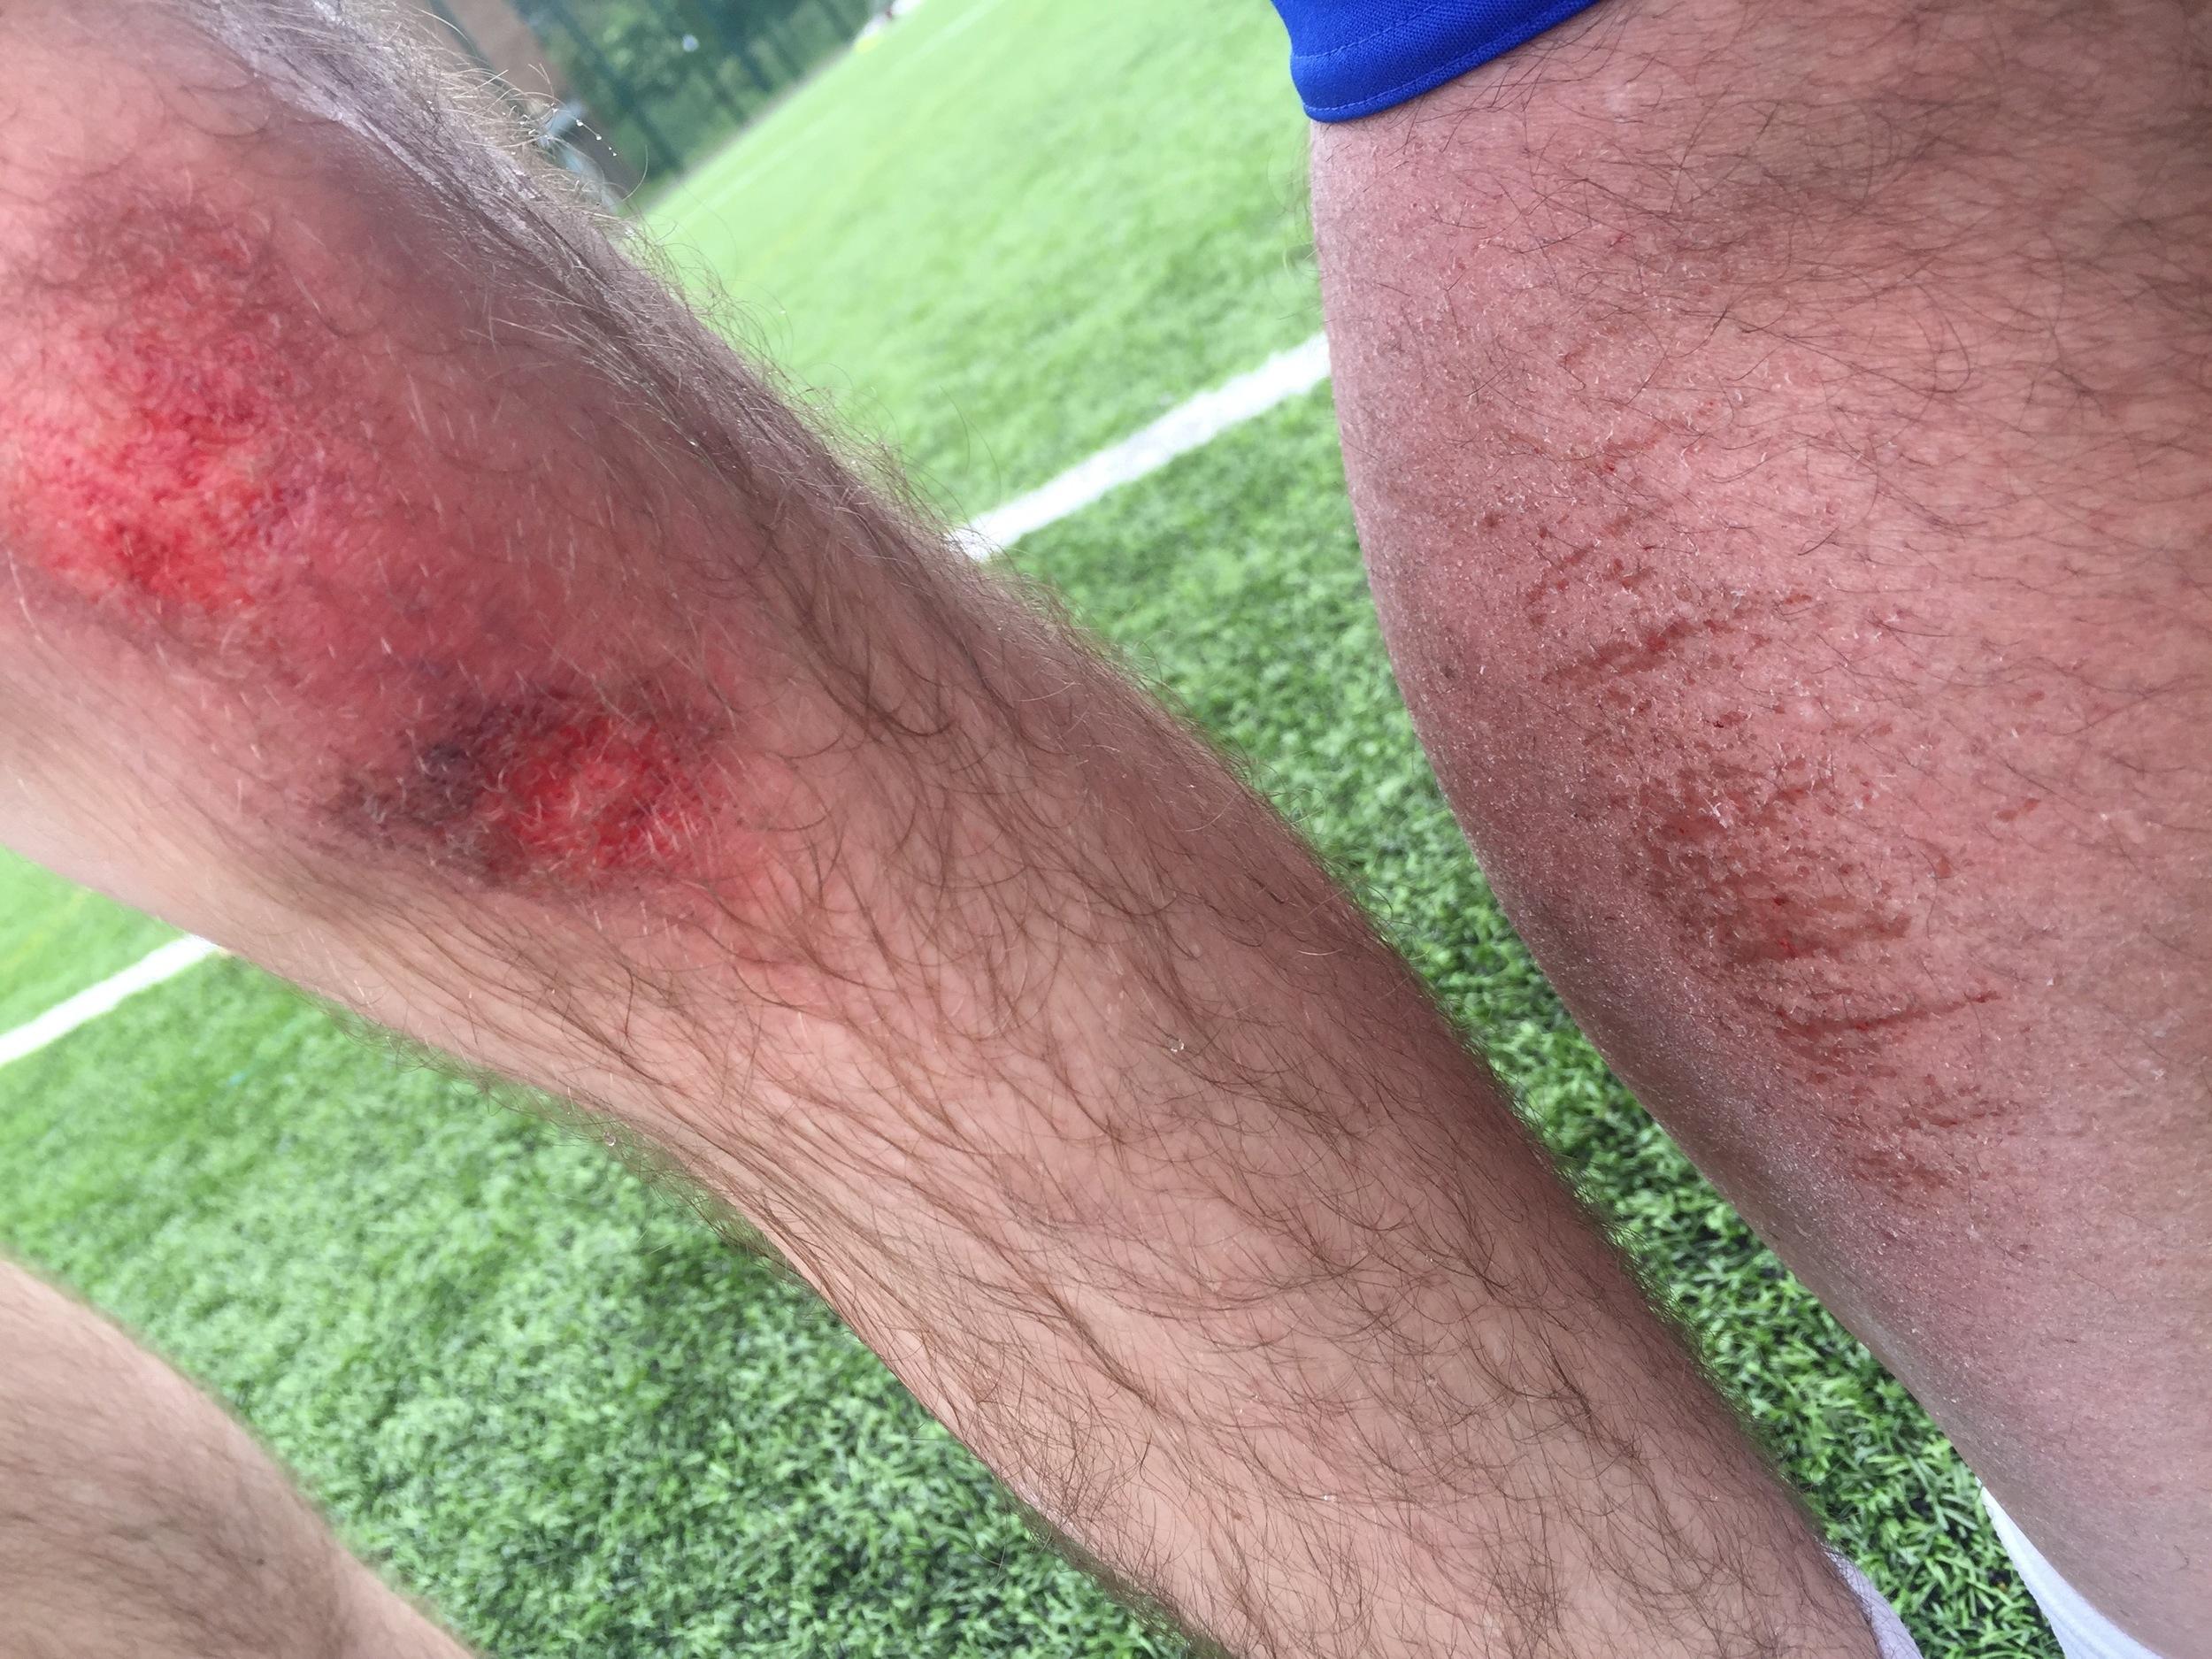 Sure Callum's leg 'looks' worse than mine!